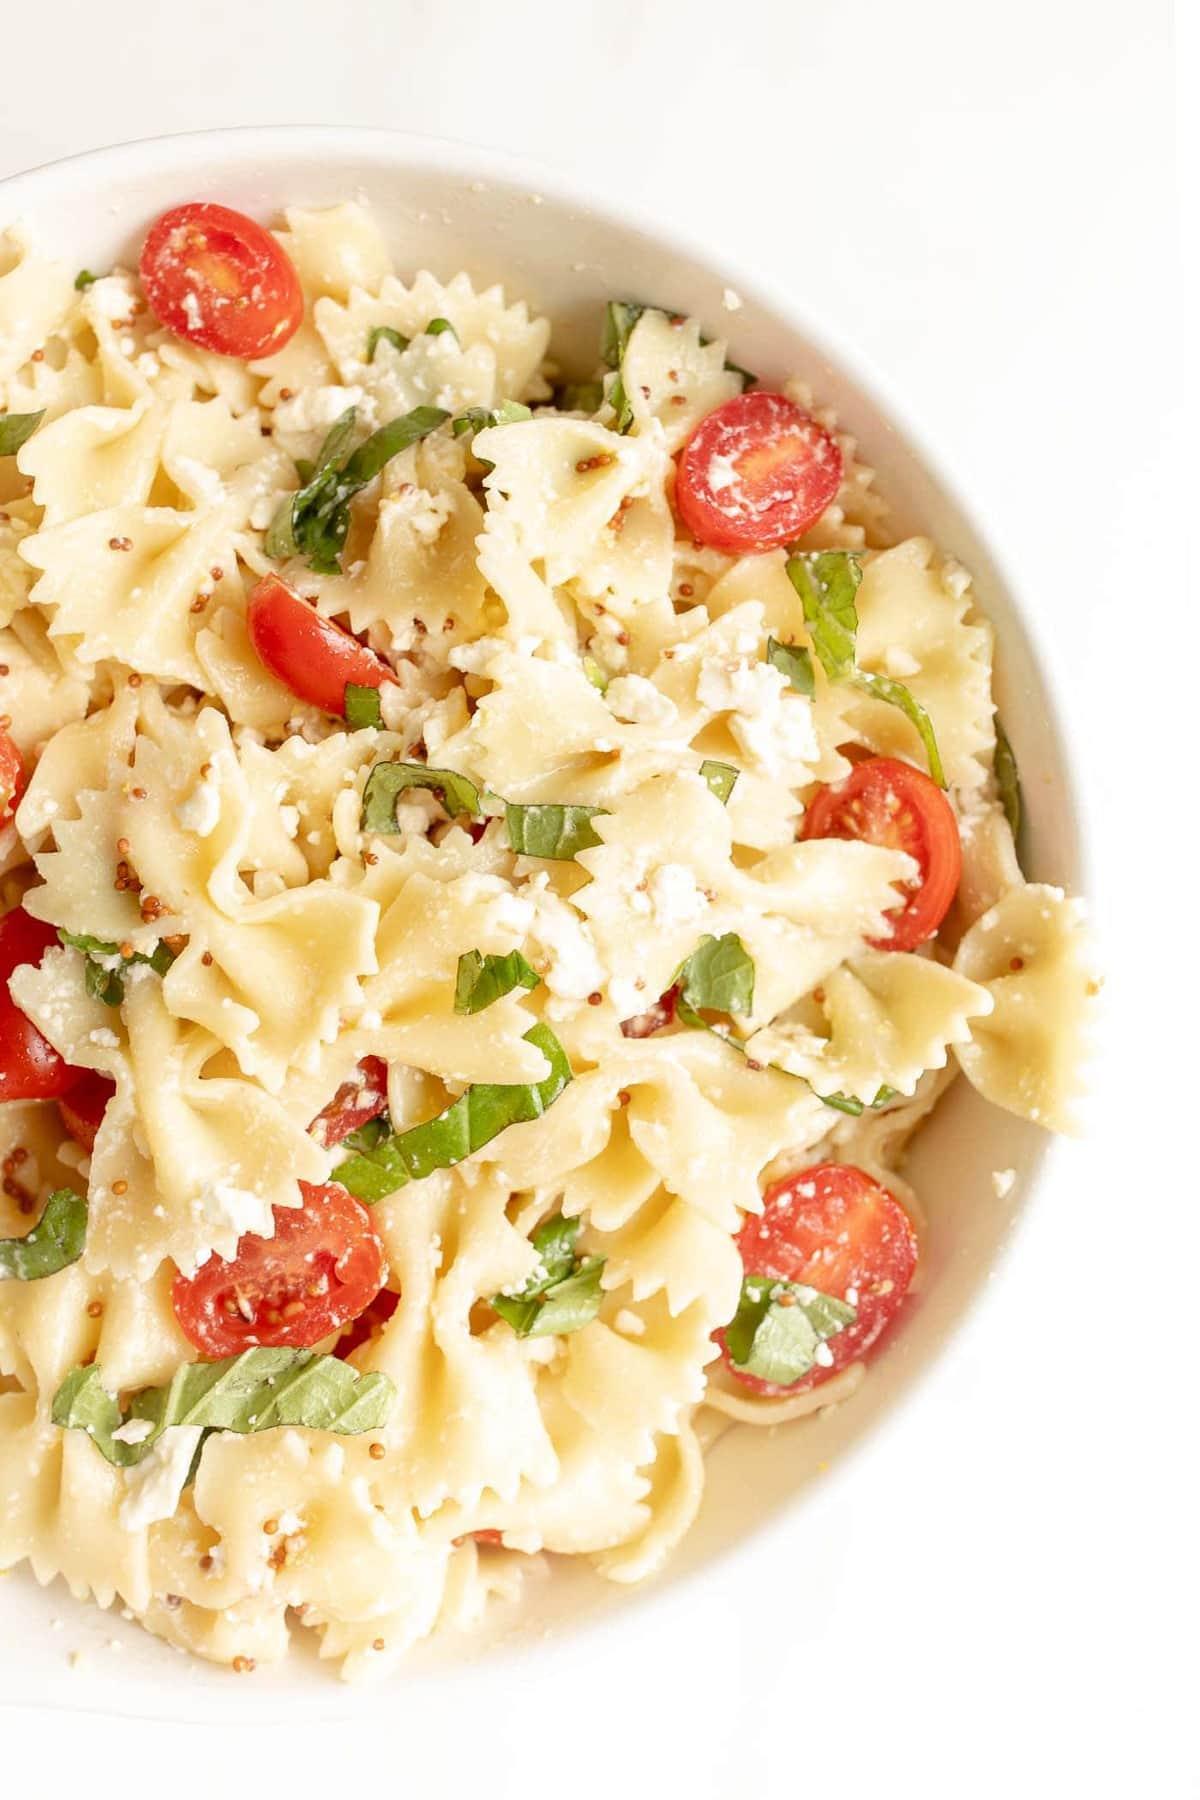 pretty bowtie pasta salad